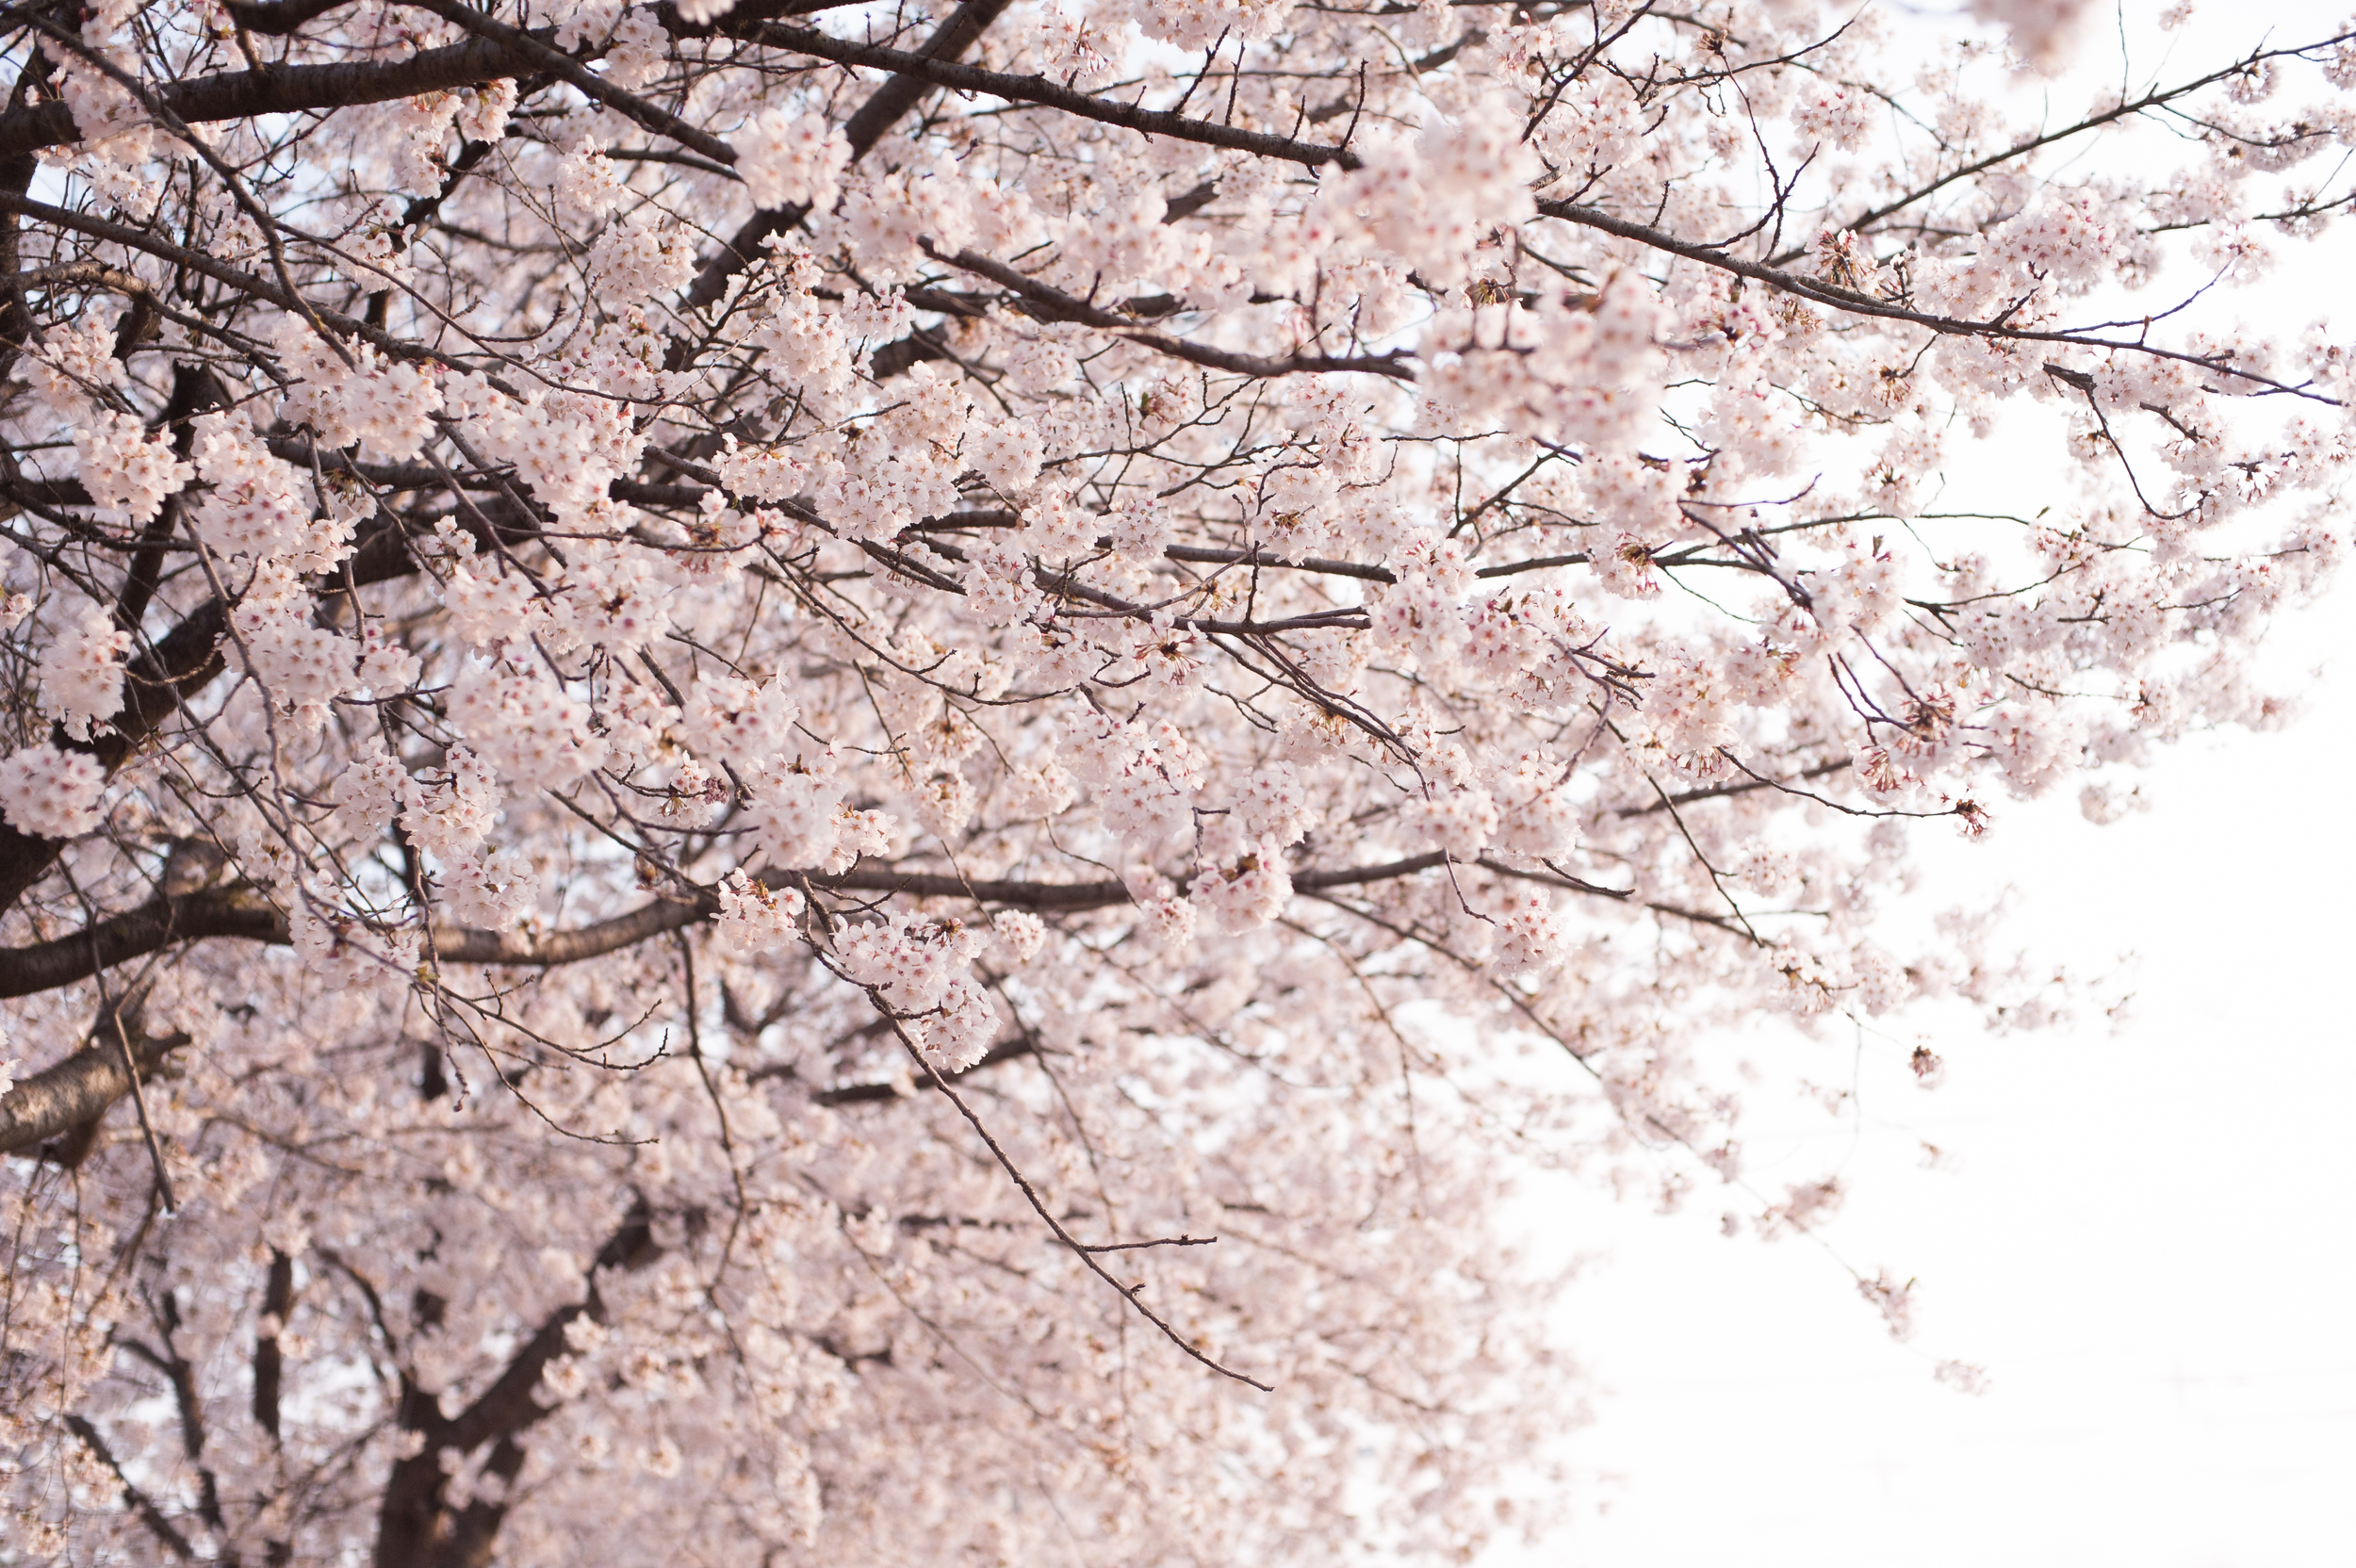 CherryBlossomsSouthKorea (4 of 5).jpg